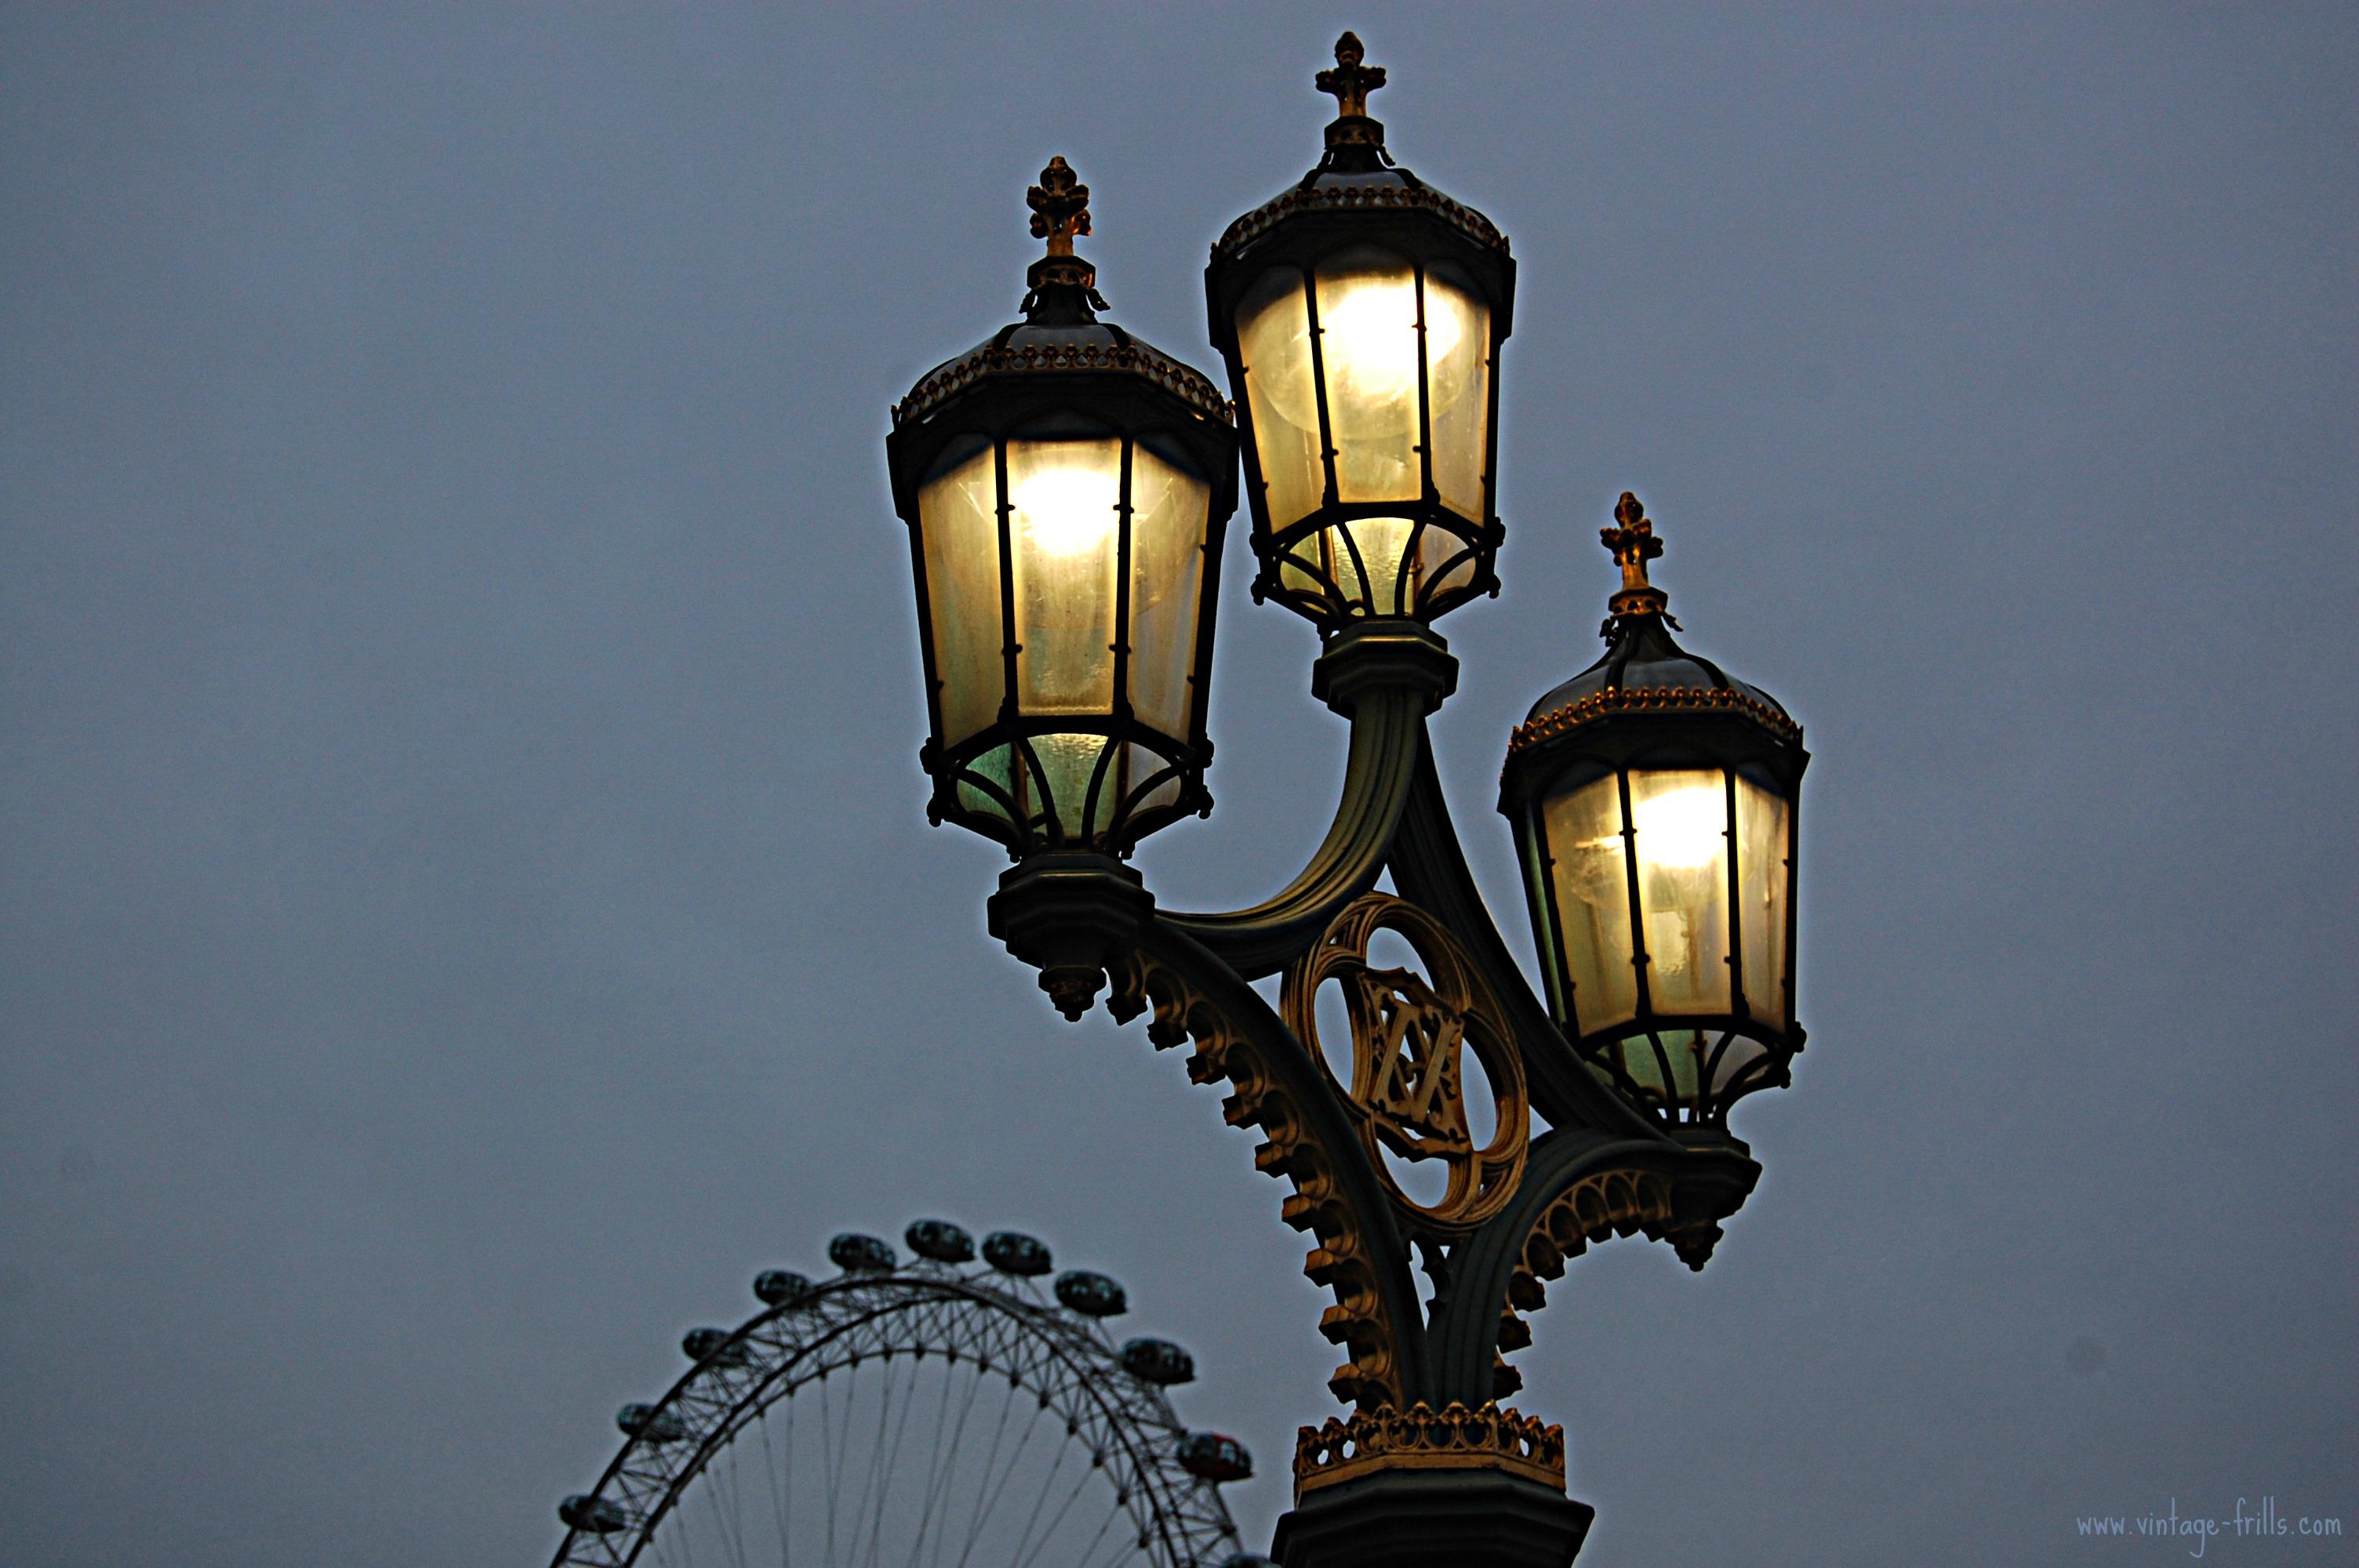 Dear London